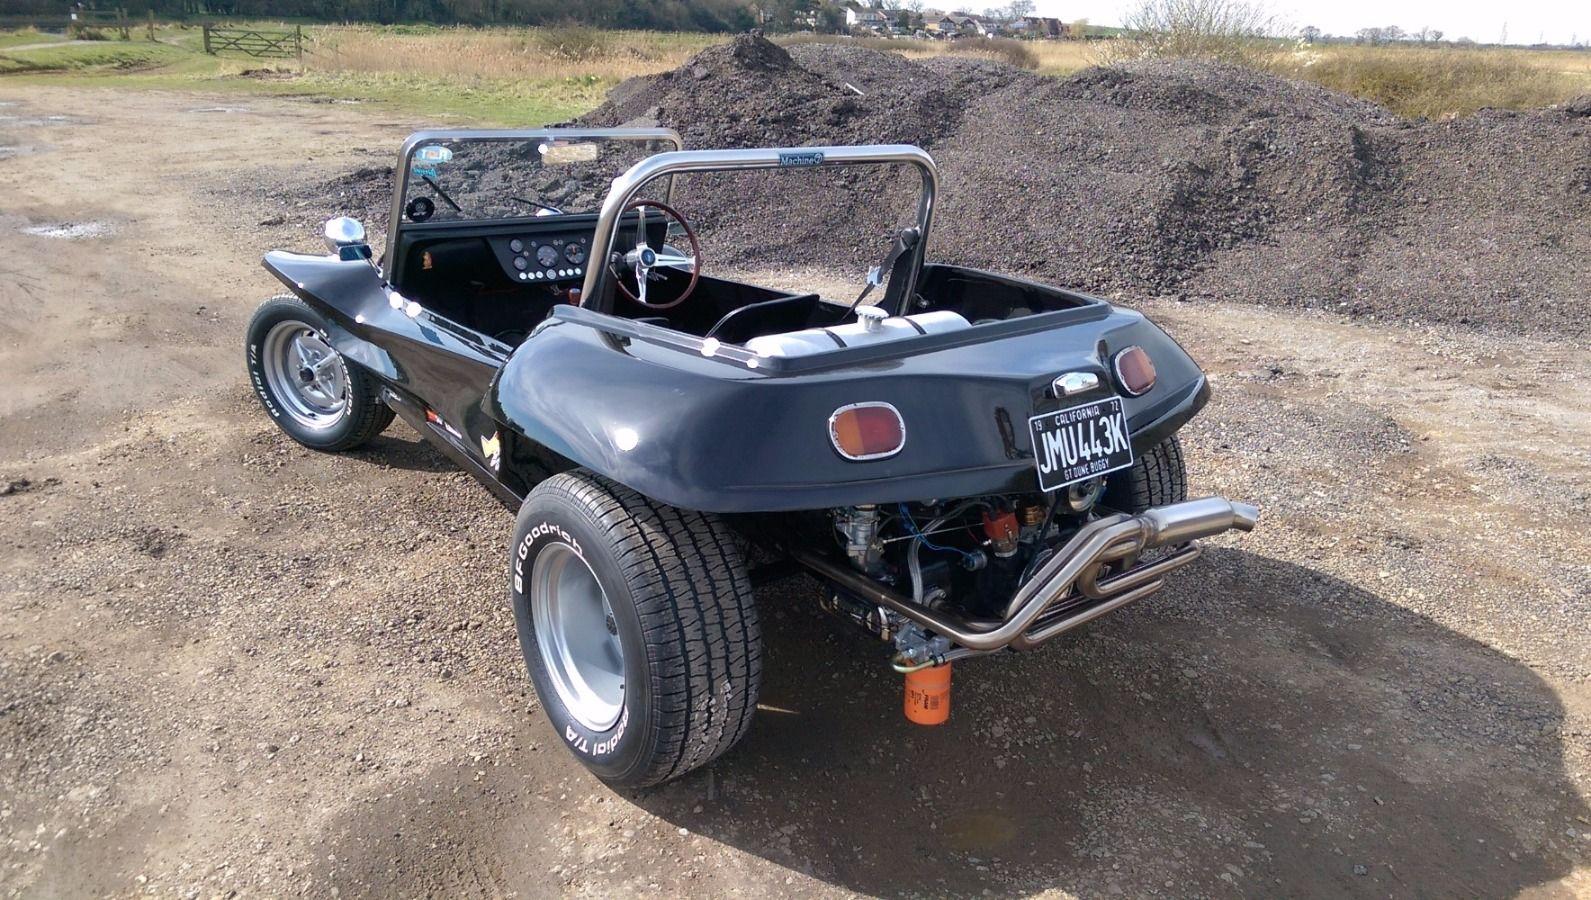 dune buggy vw baja bug CRANK RACER SPACER